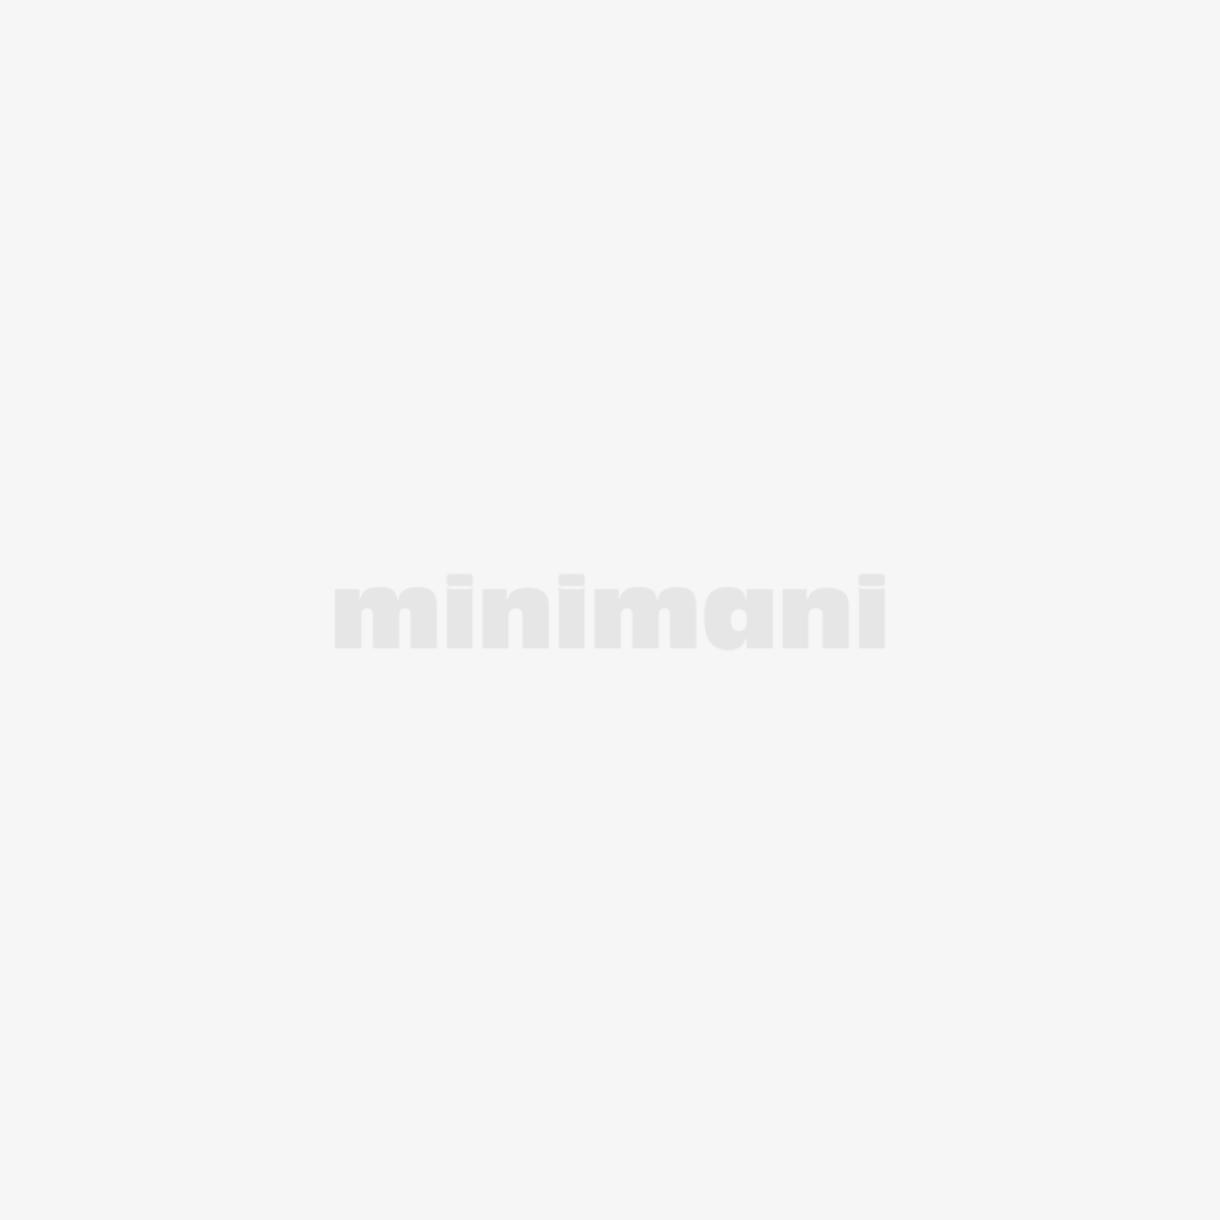 Marc De Champagne käärekonvehdit 350g